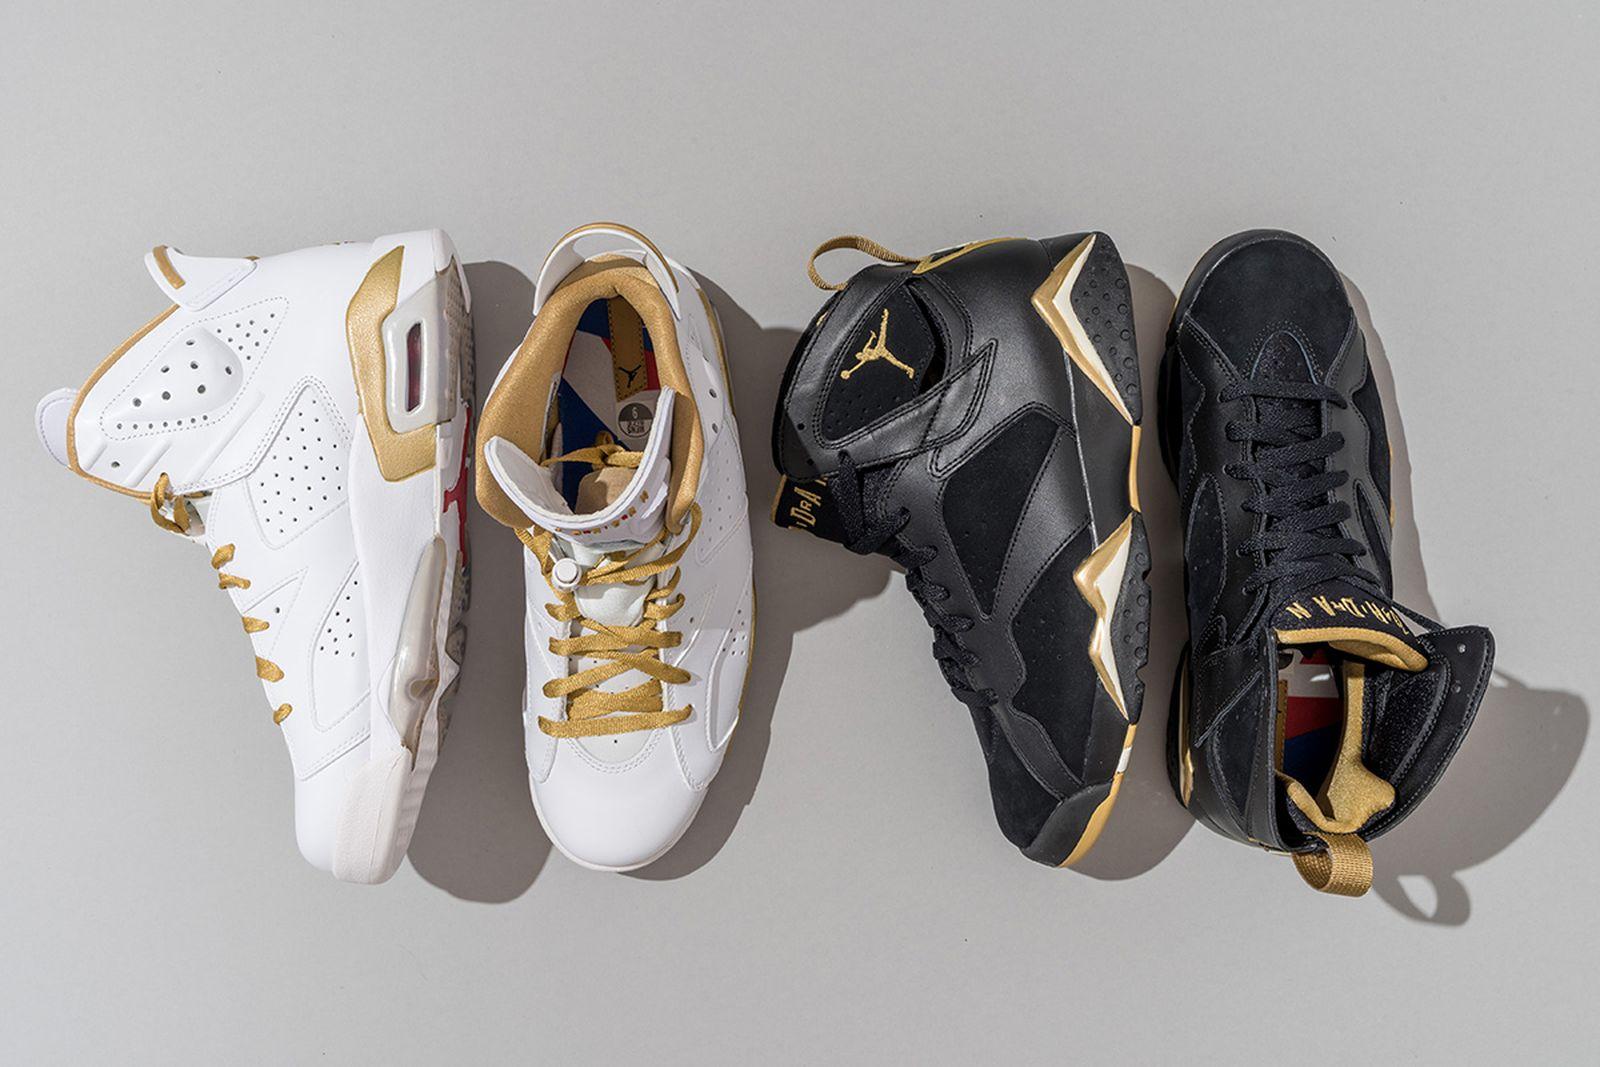 brad-hogan-jordan-sneaker-collection-28